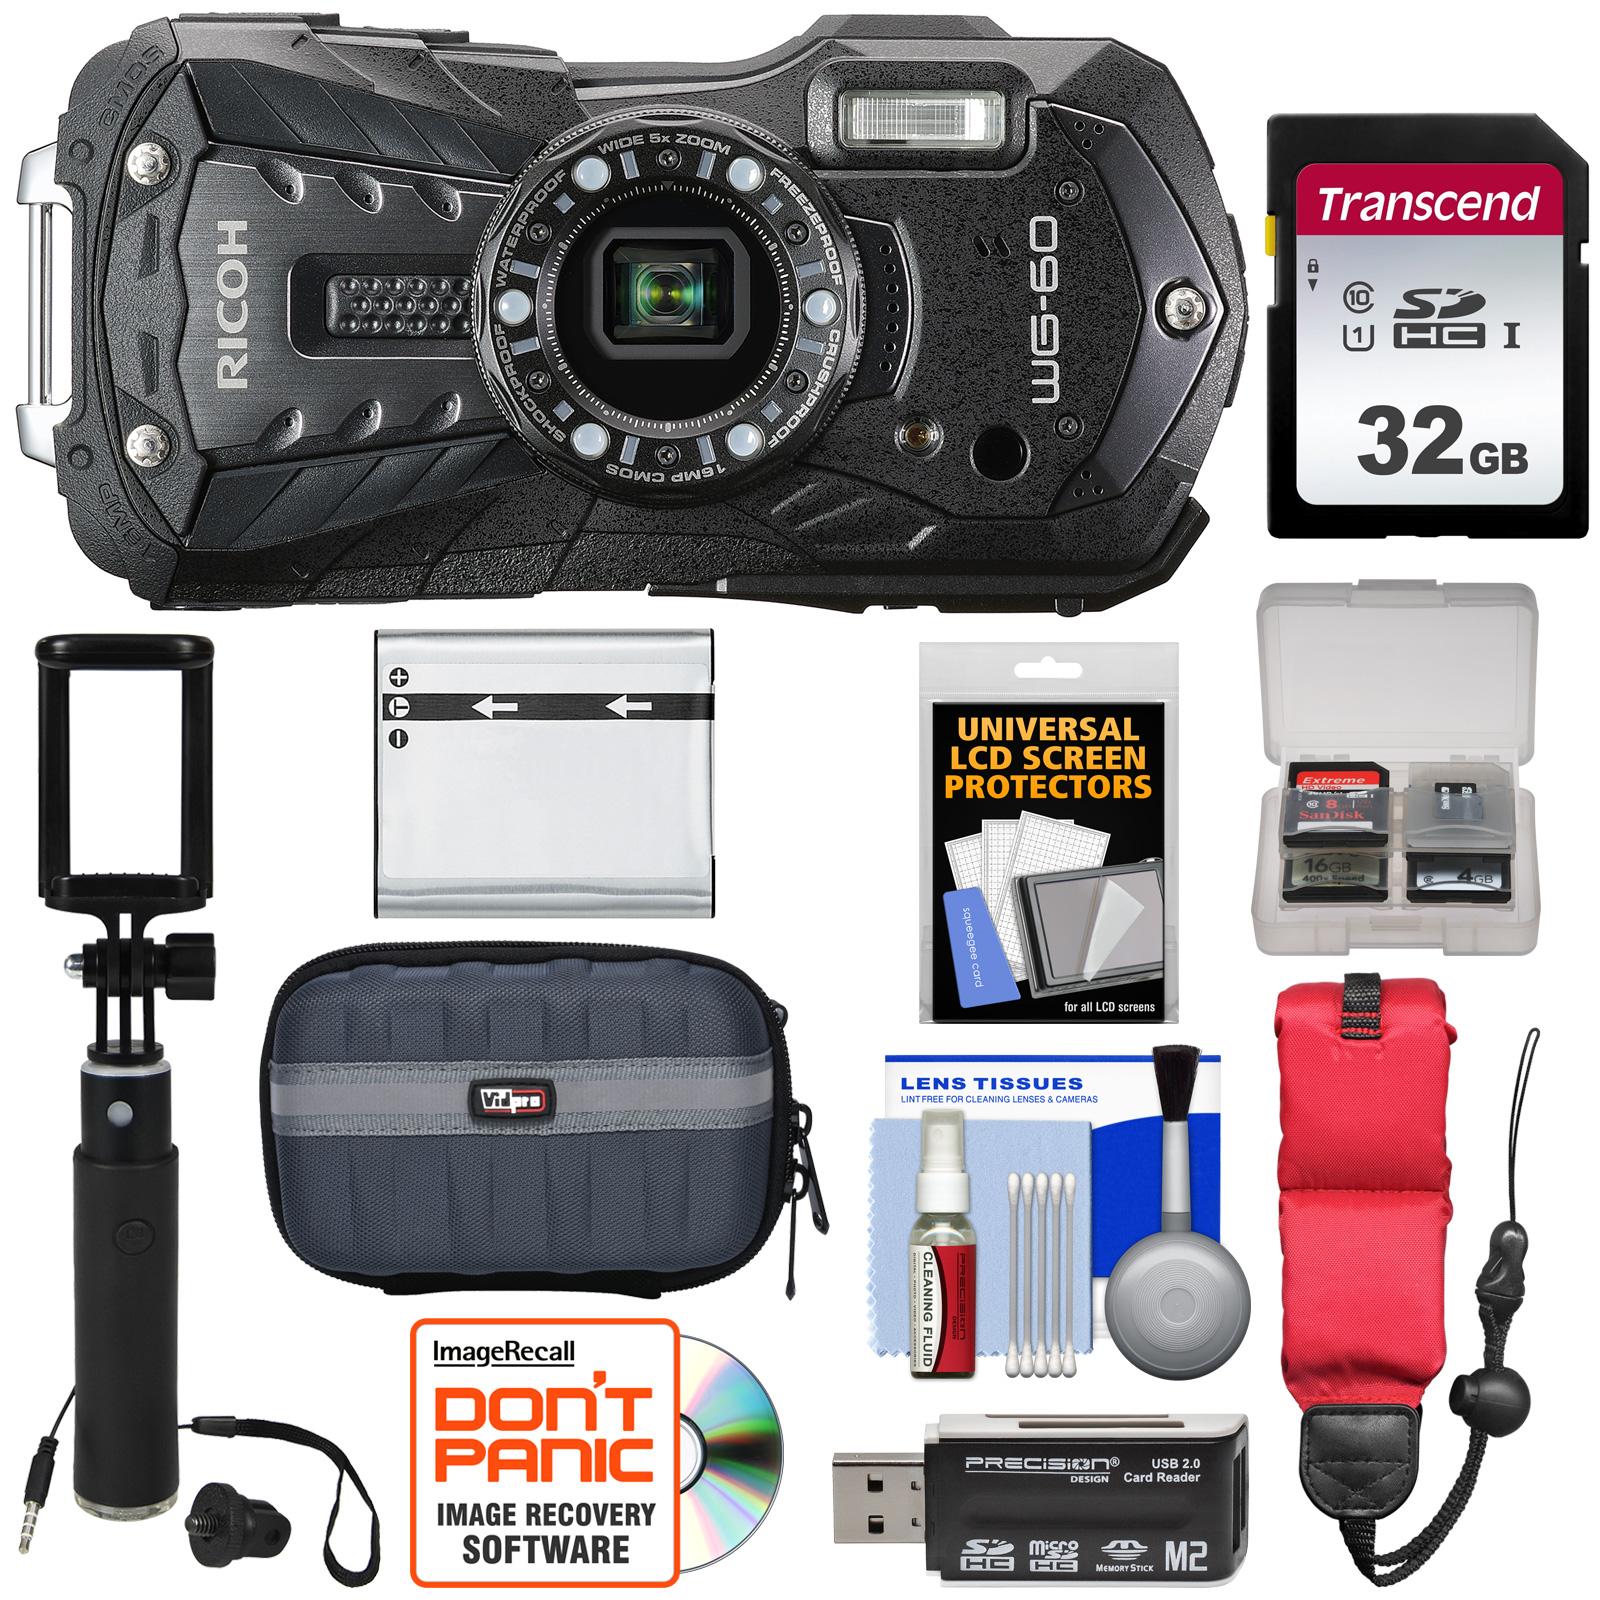 Ricoh WG-60 Waterproof / Shockproof Digital Camera (Black) with 32GB Card + Battery + Case + Selfie Stick + Floating Strap + Kit